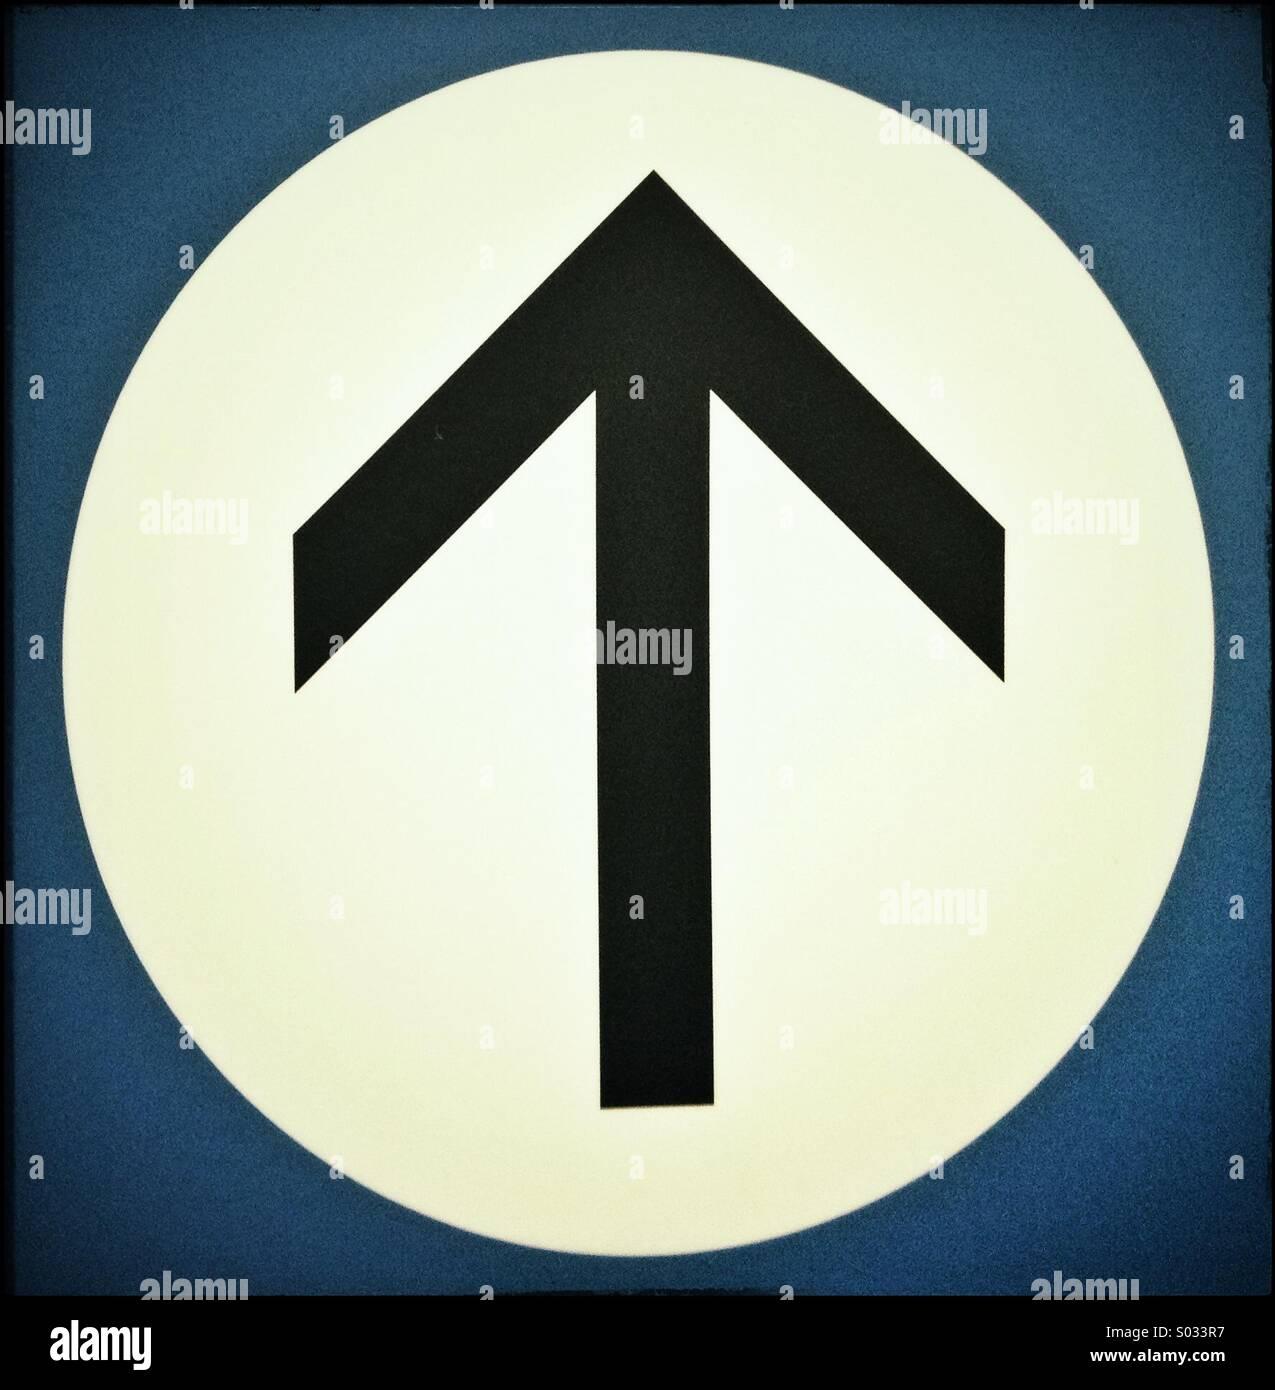 Arrow pointing upwards - Stock Image